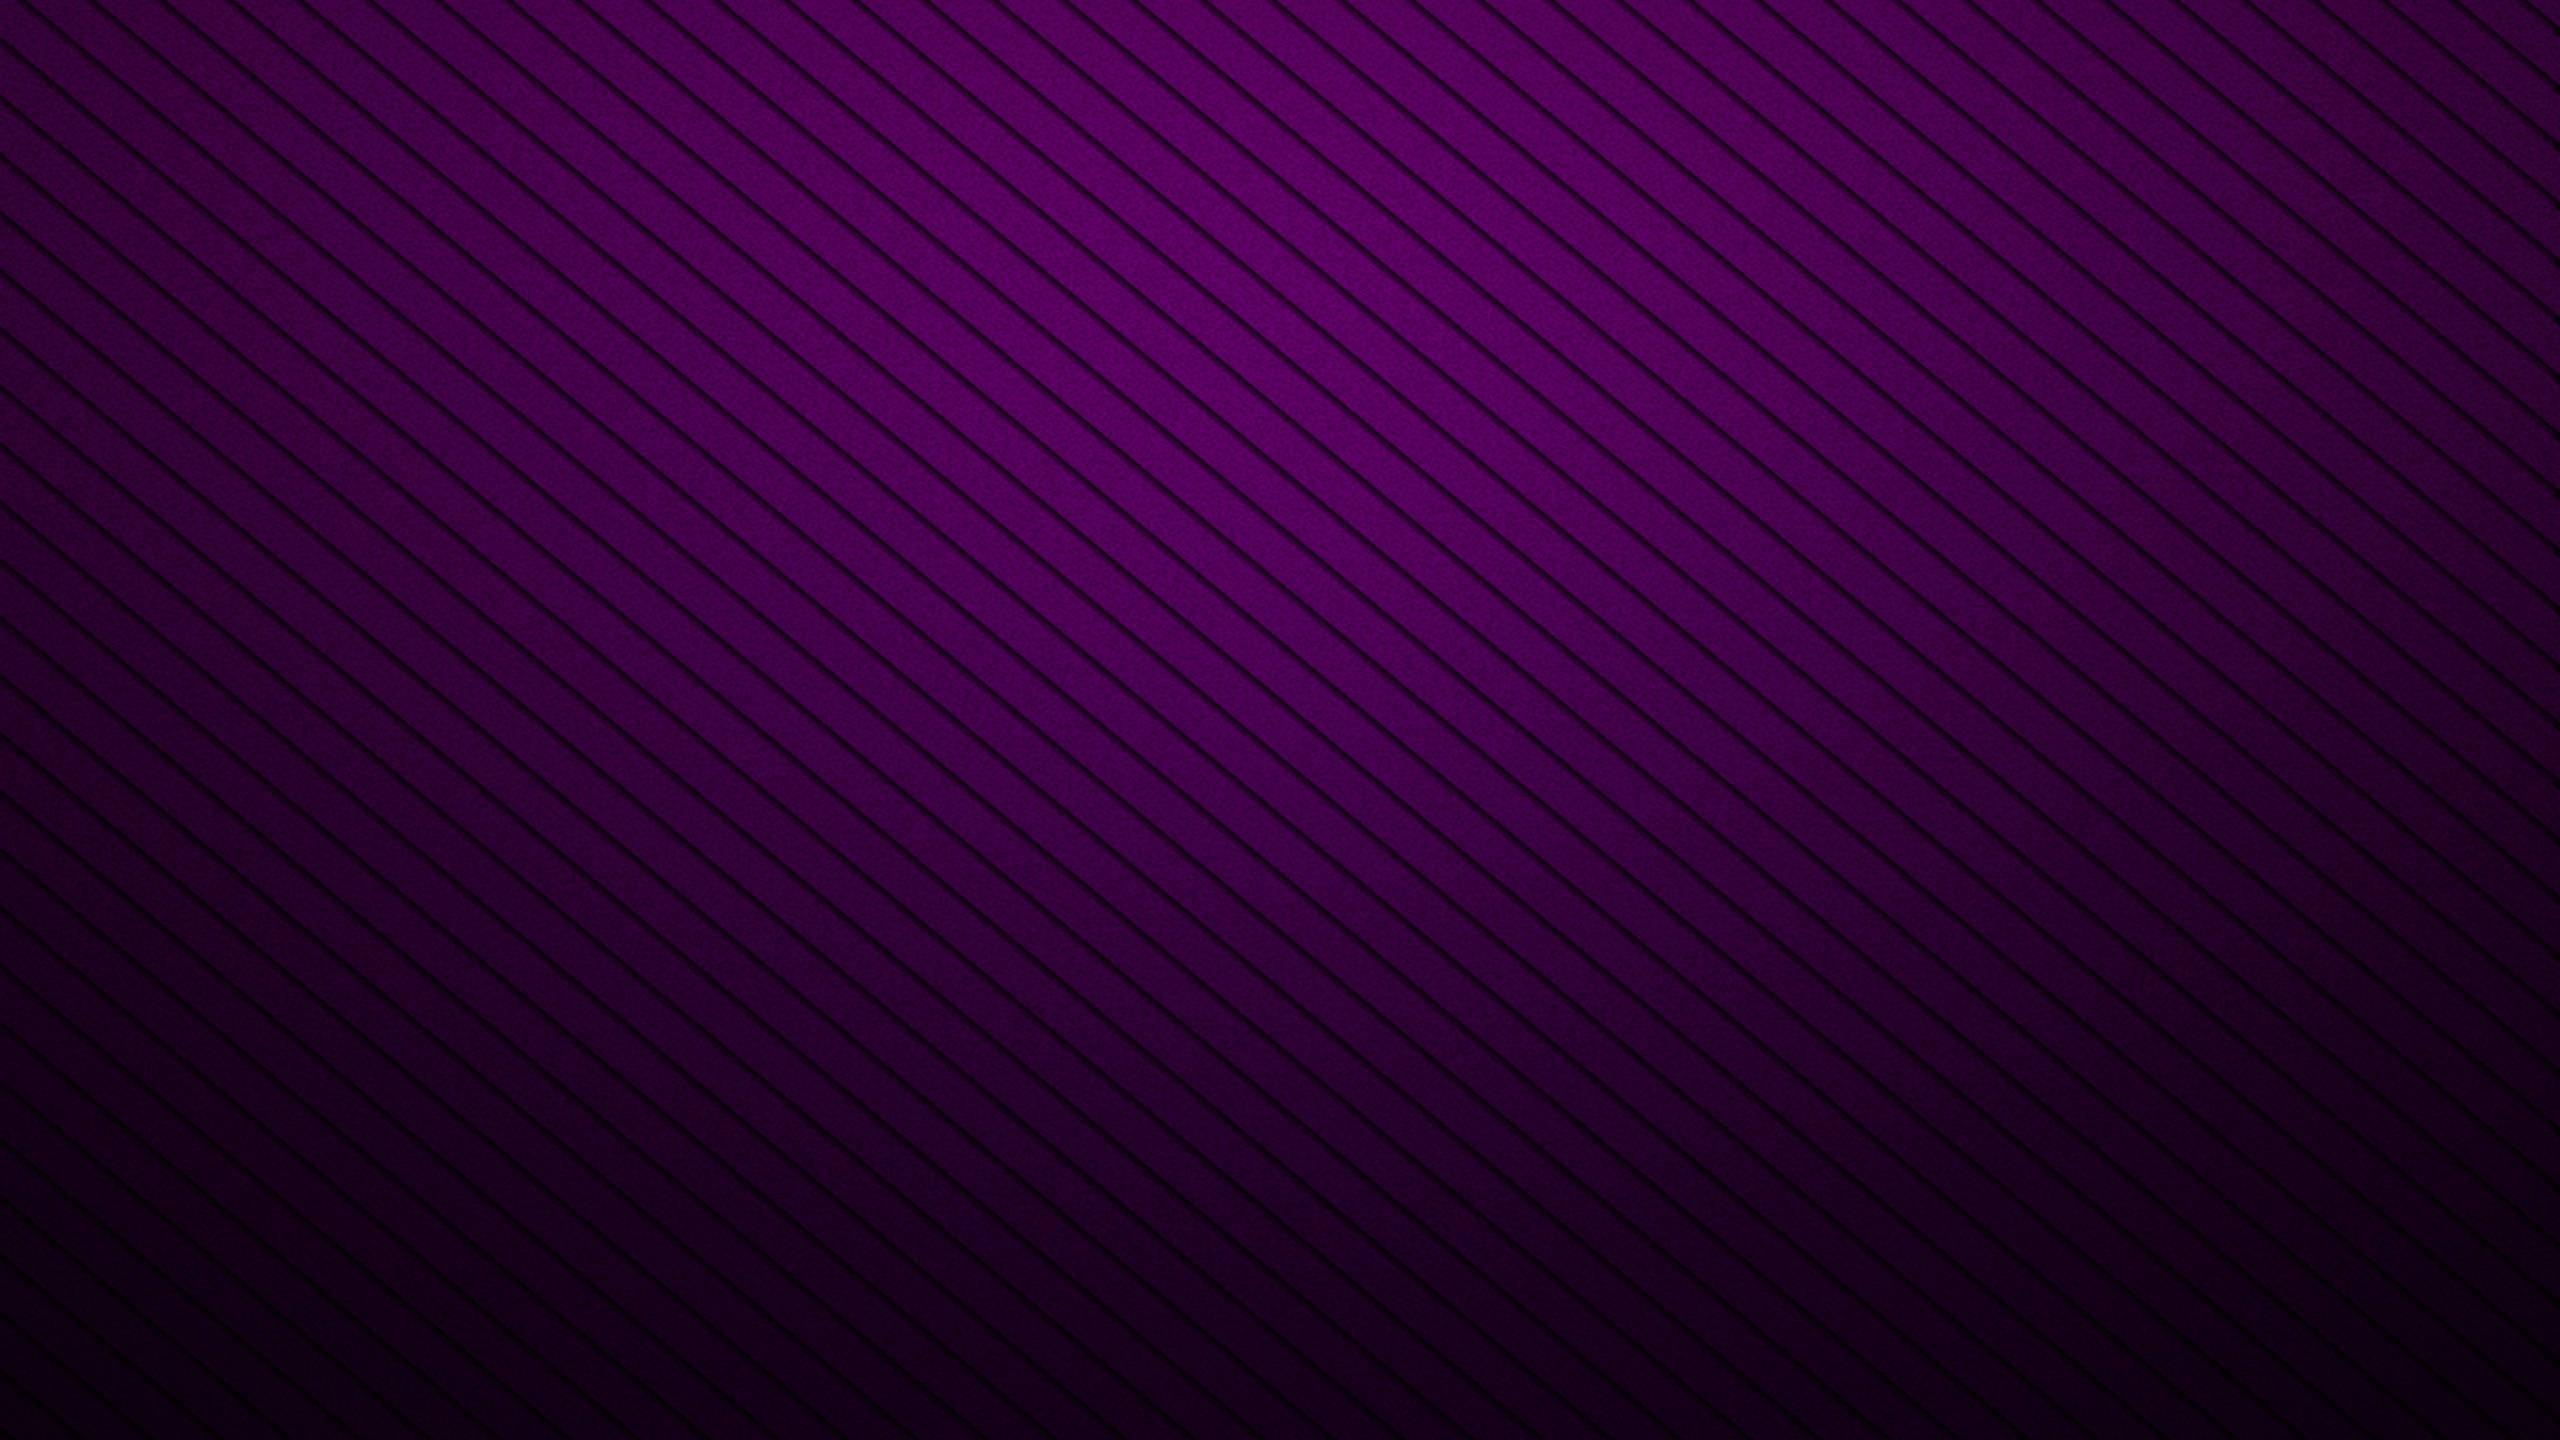 Purple And Black Wallpaper   Desktop Backgrounds 2560x1440